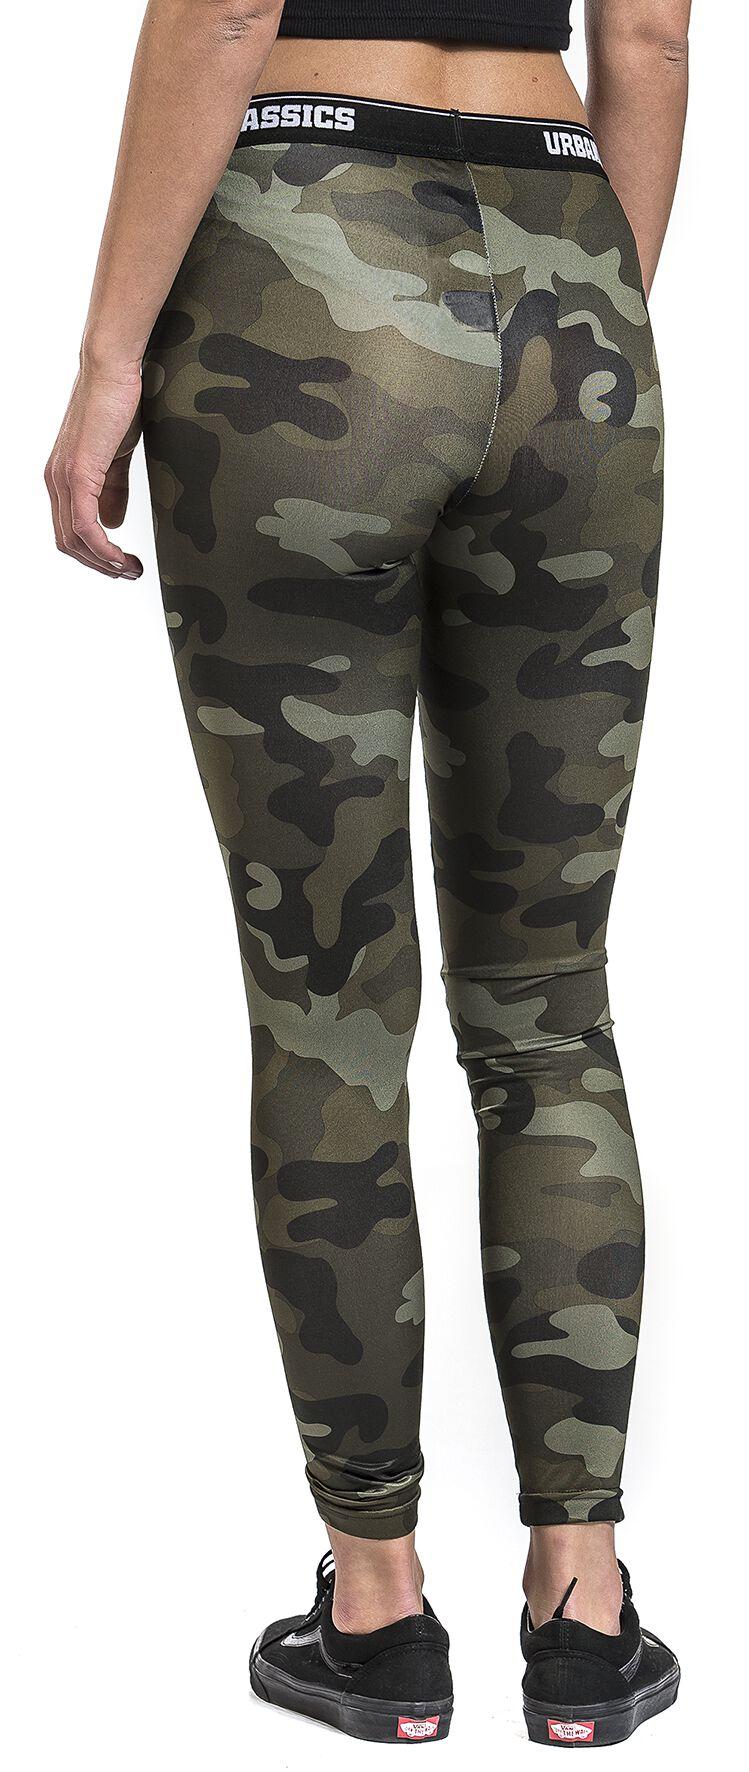 Shop for and buy leggins online at Macy's. Find leggins at Macy's.